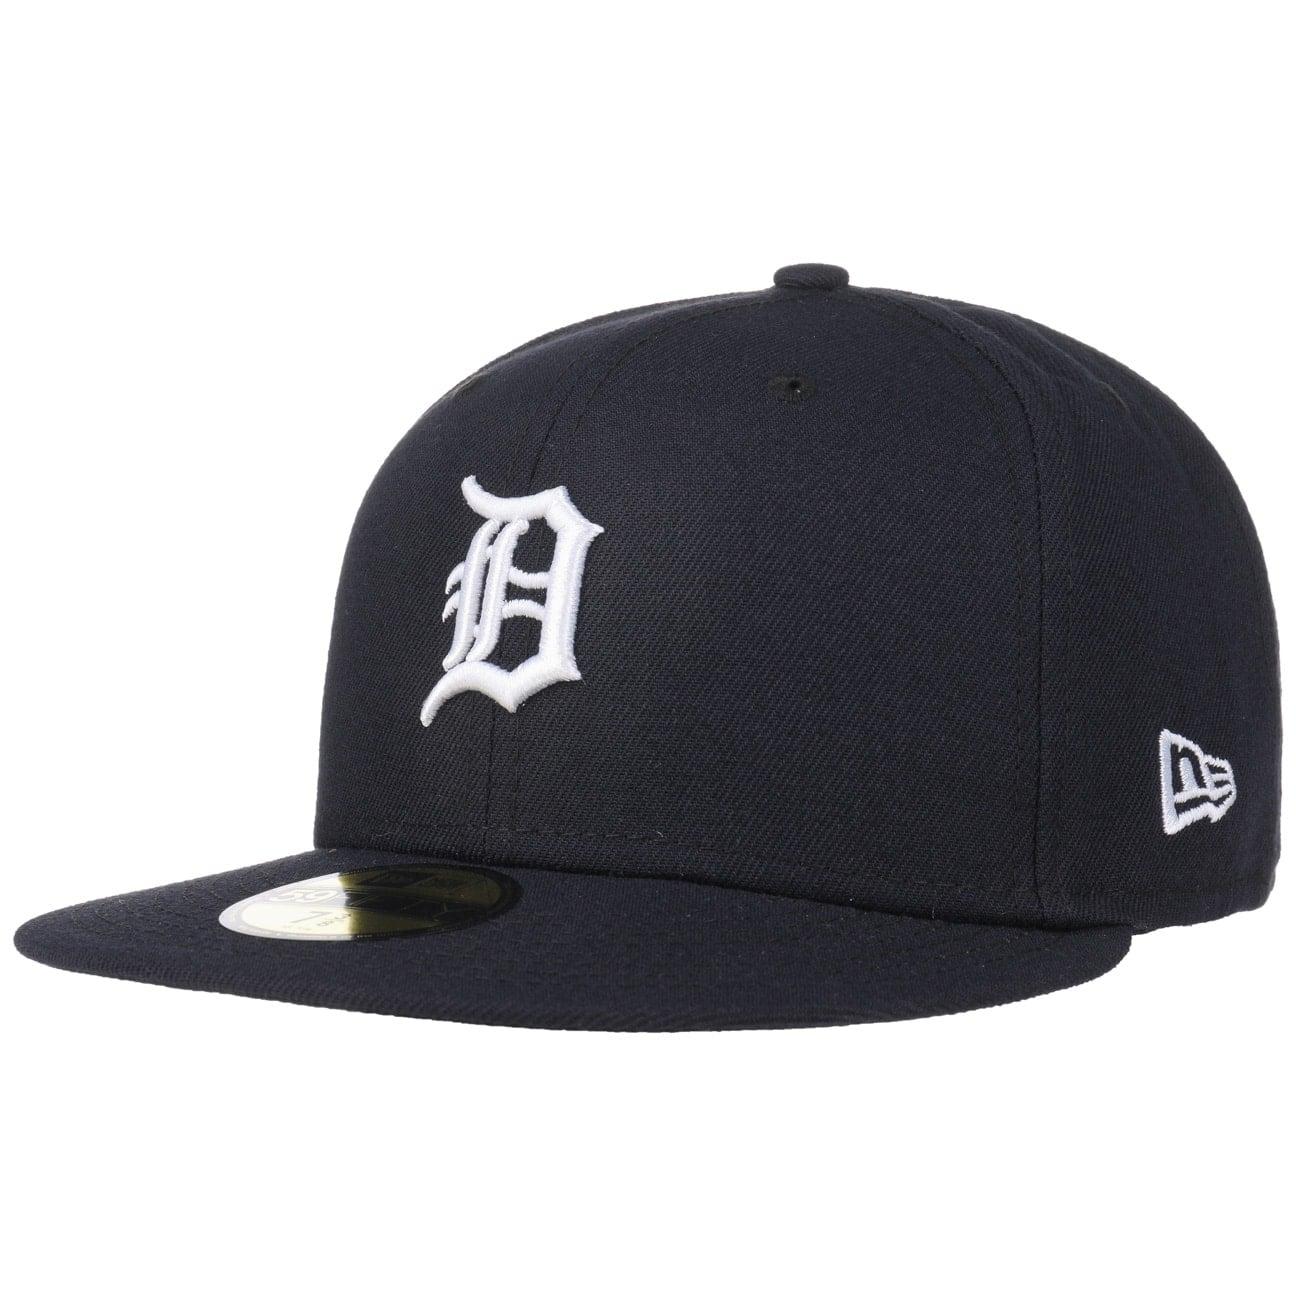 59fifty-tsf-tigers-cap-by-new-era-basecap